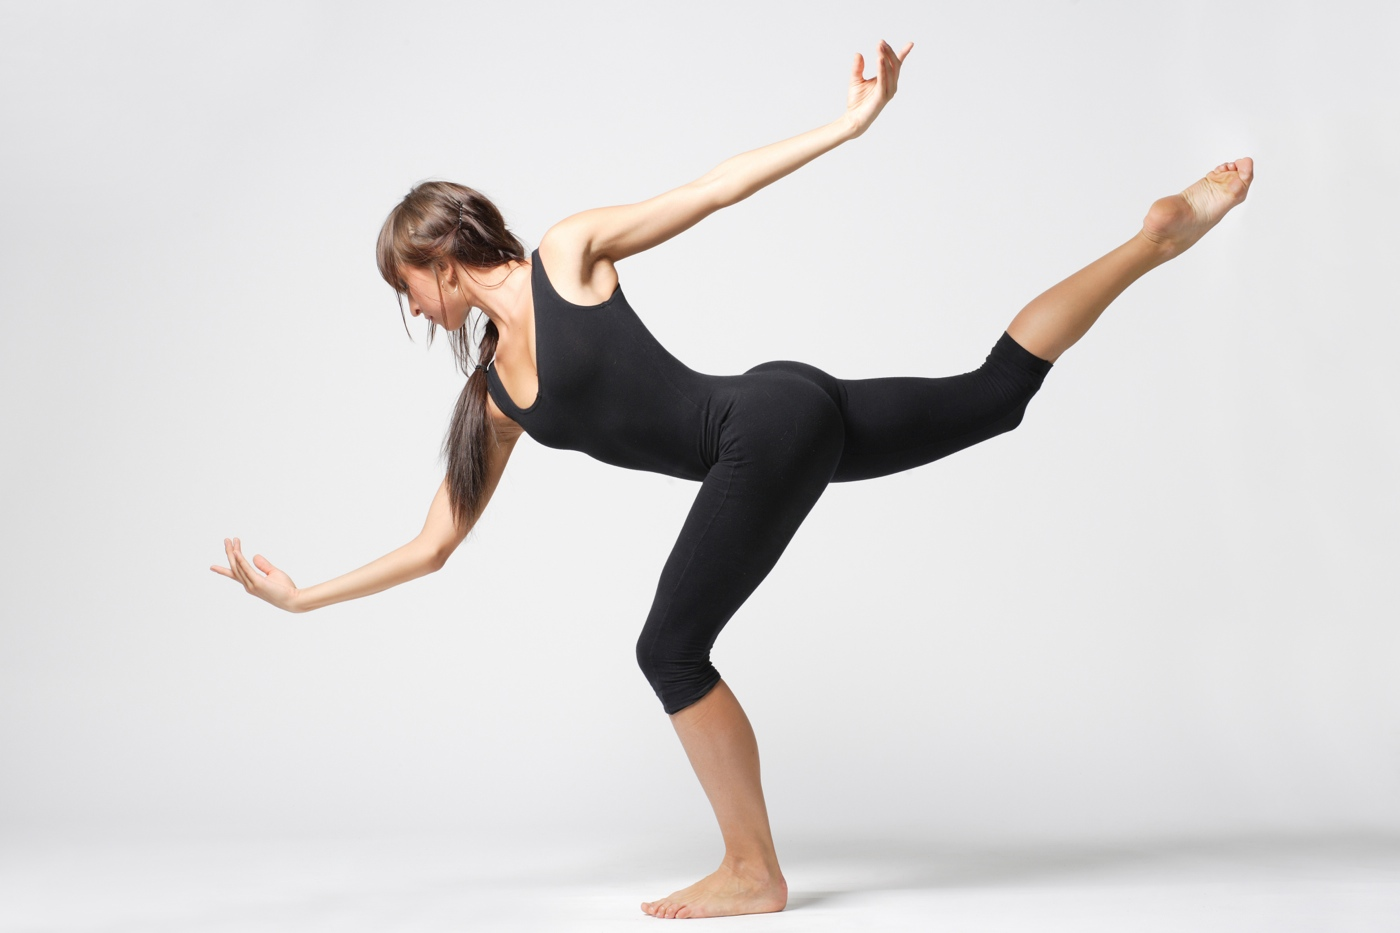 Woman gracefully dancing